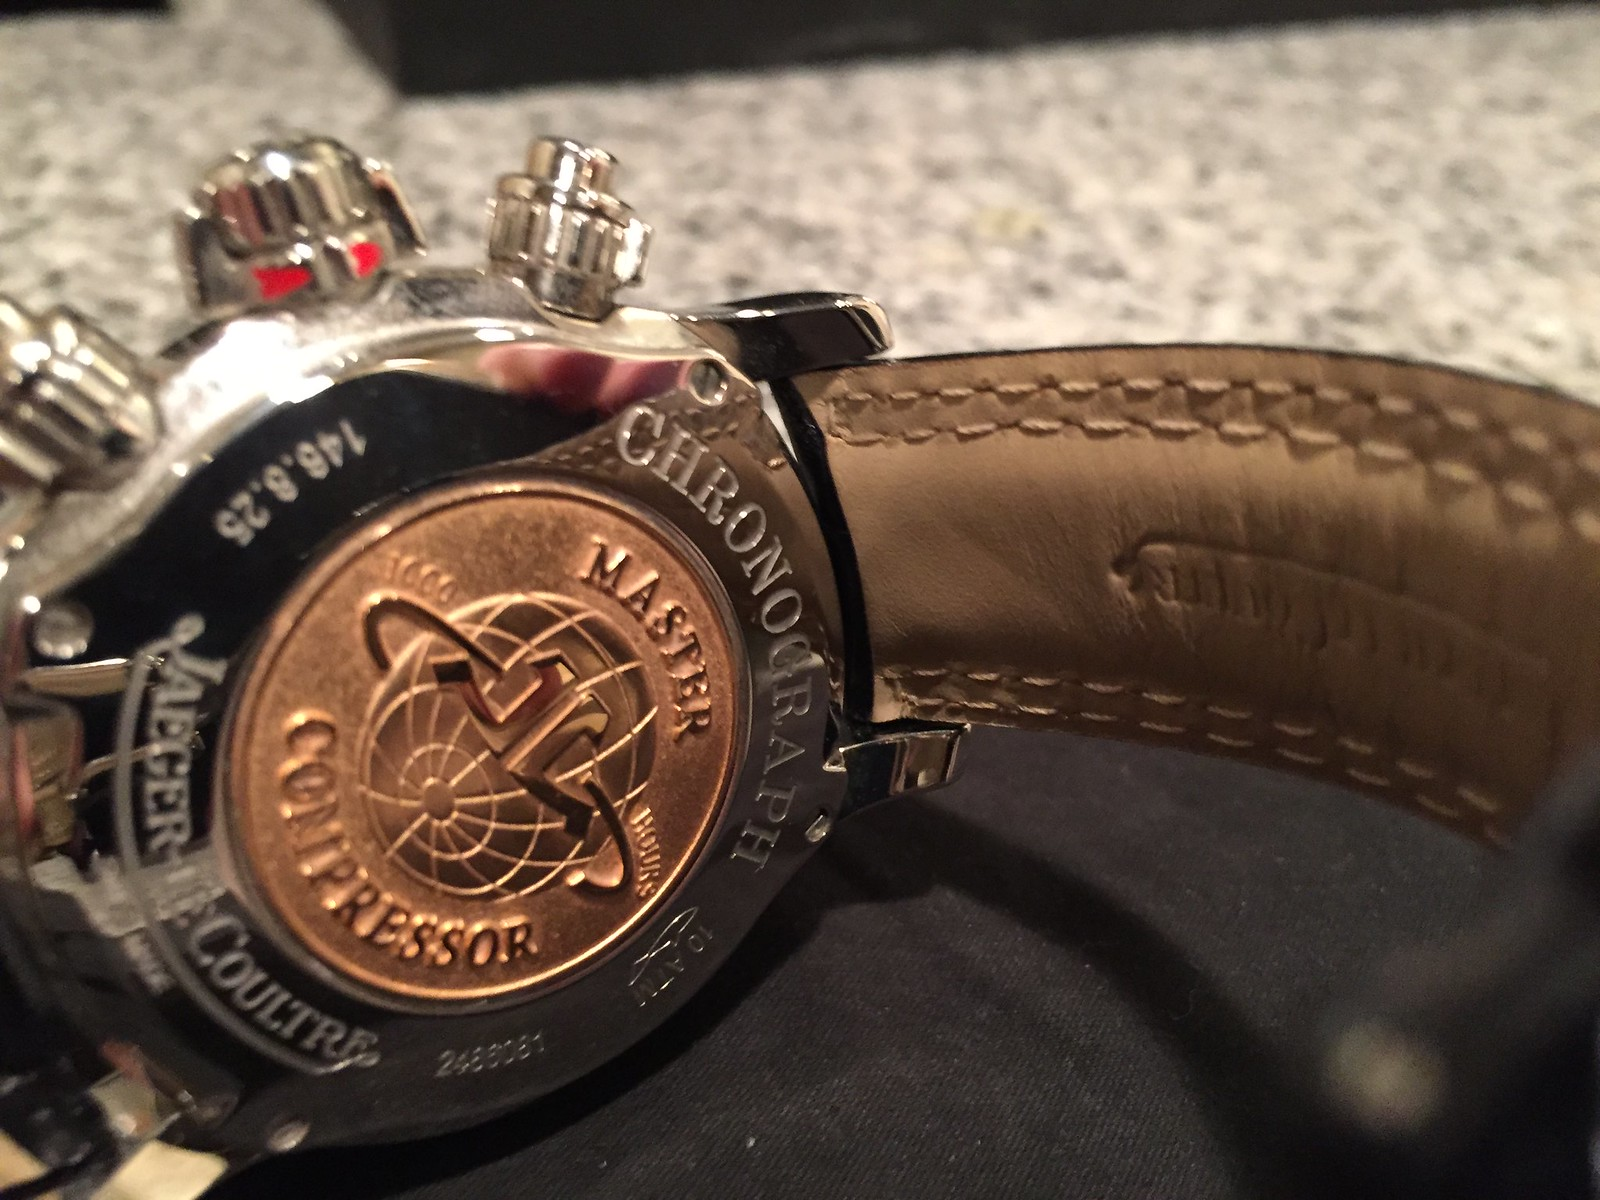 Fs Jlc Master Compressor Chronograph